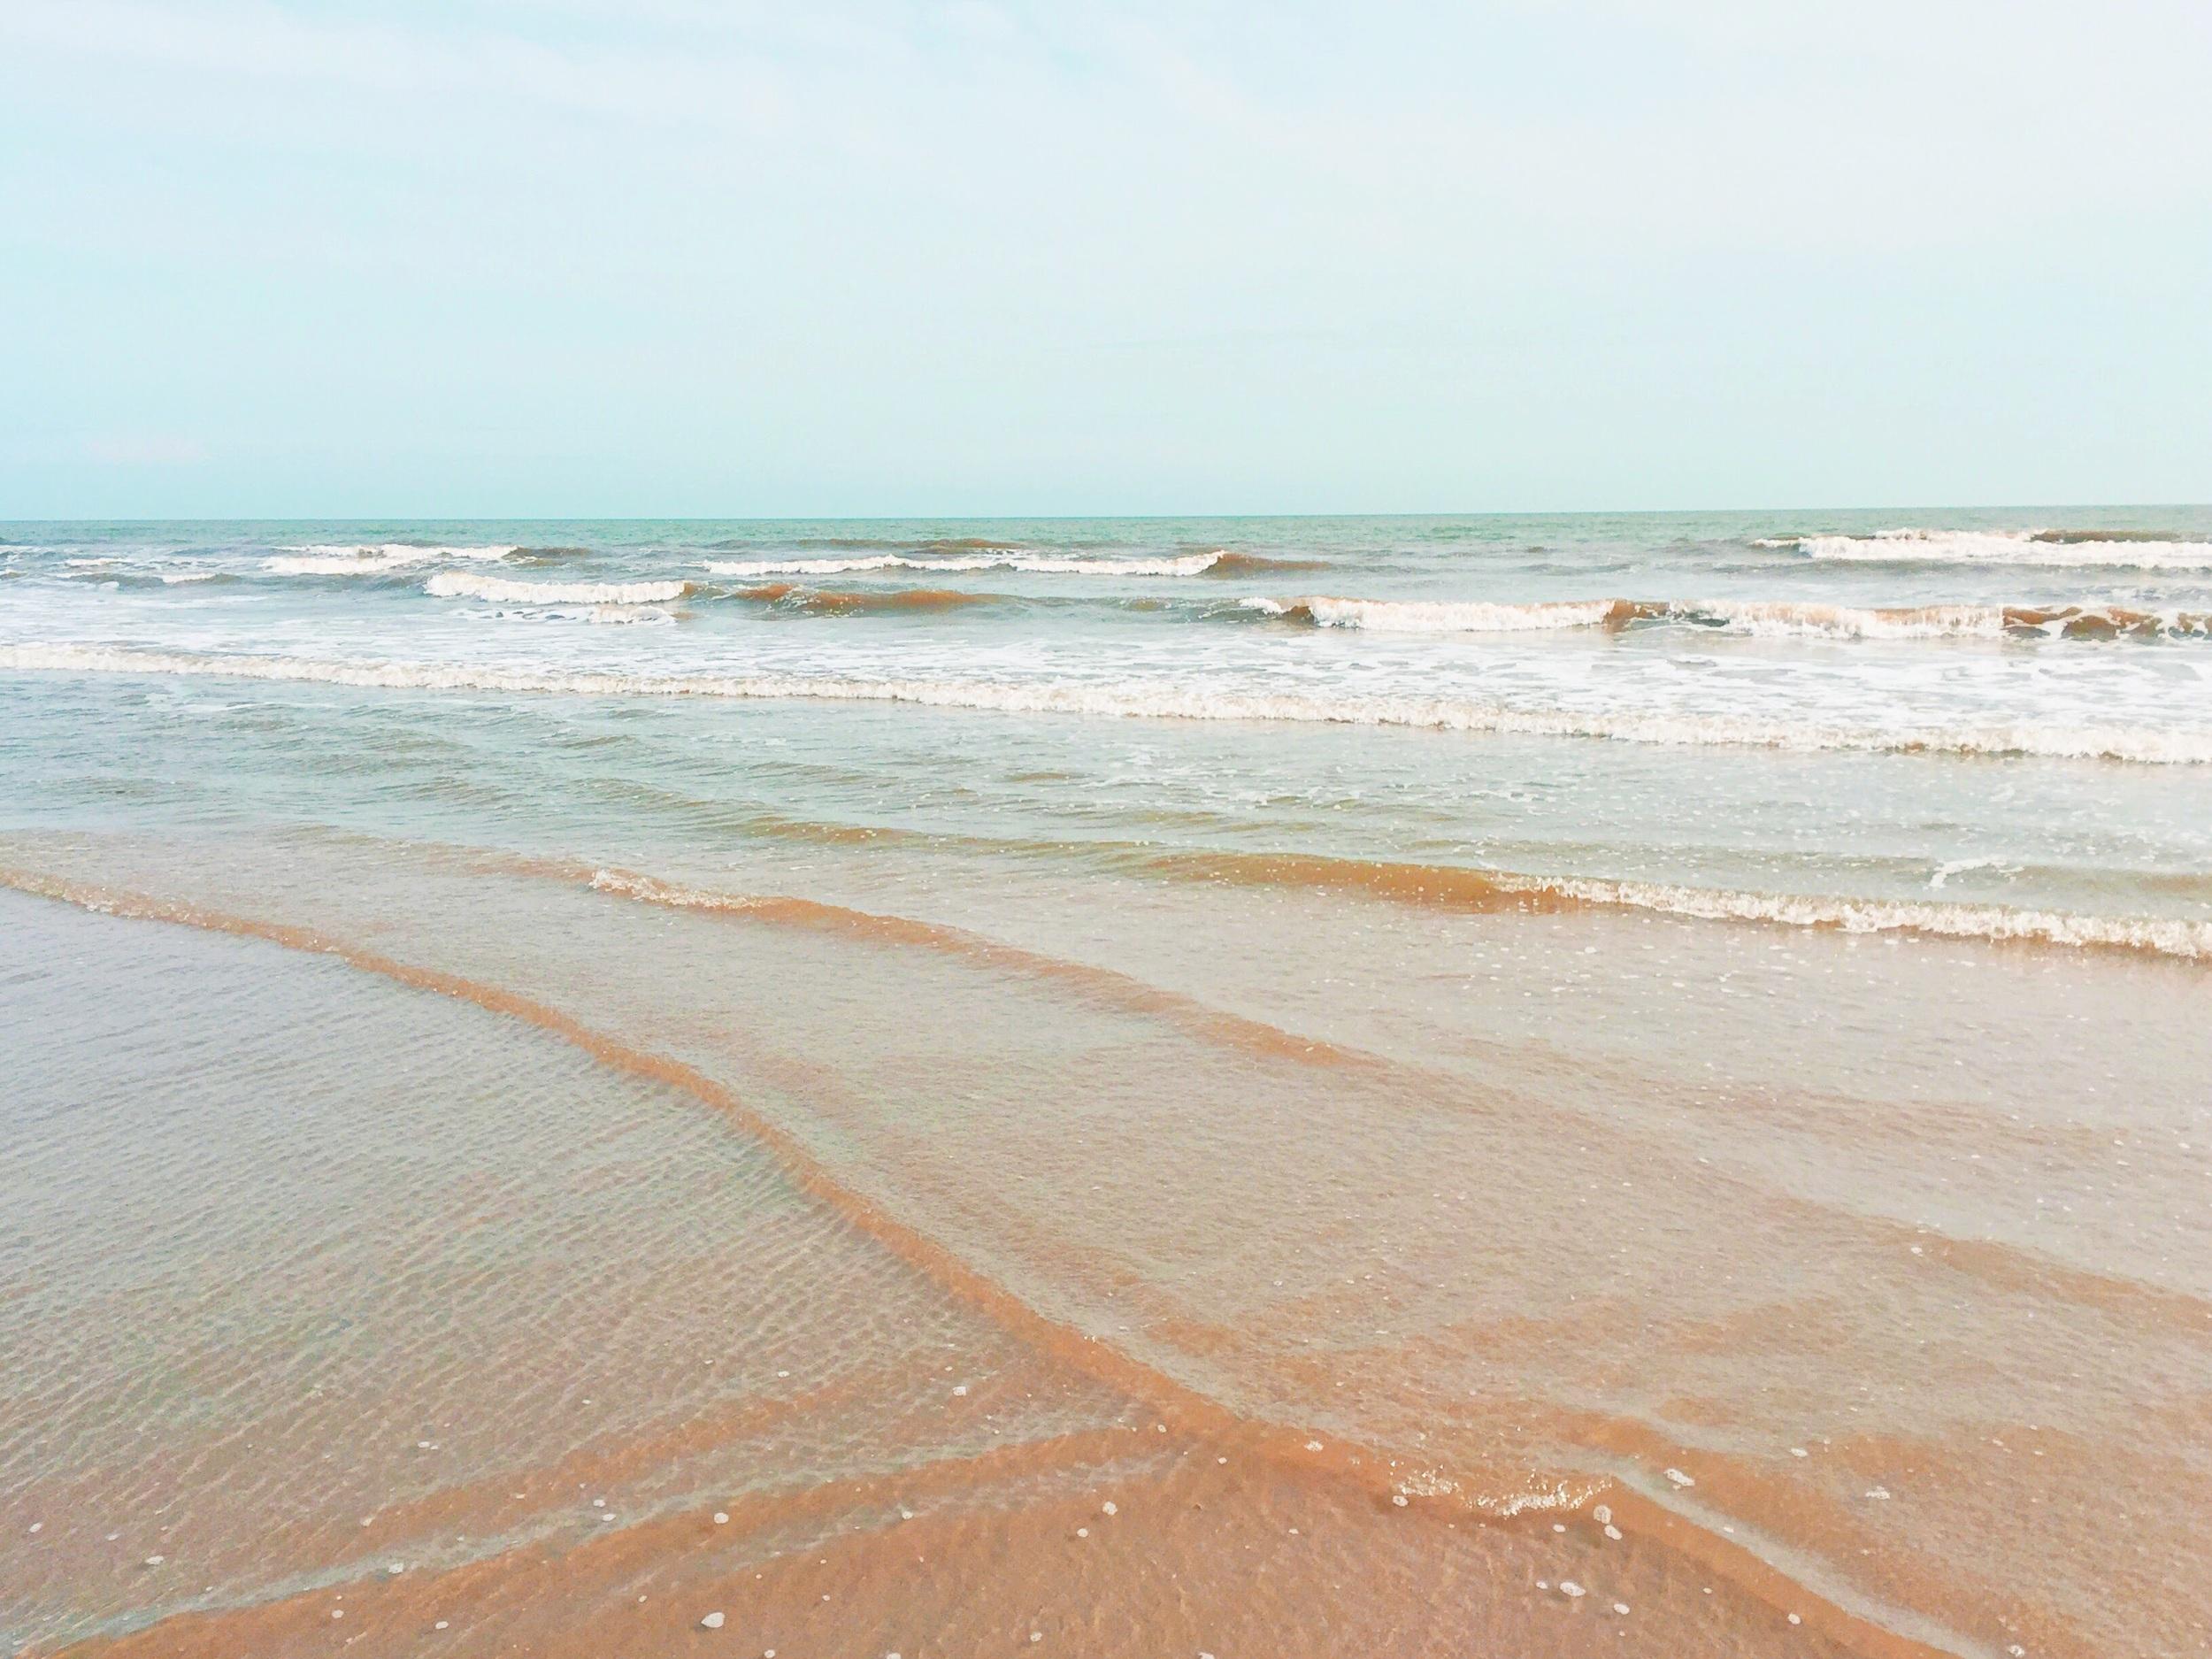 beach-ocean-waves